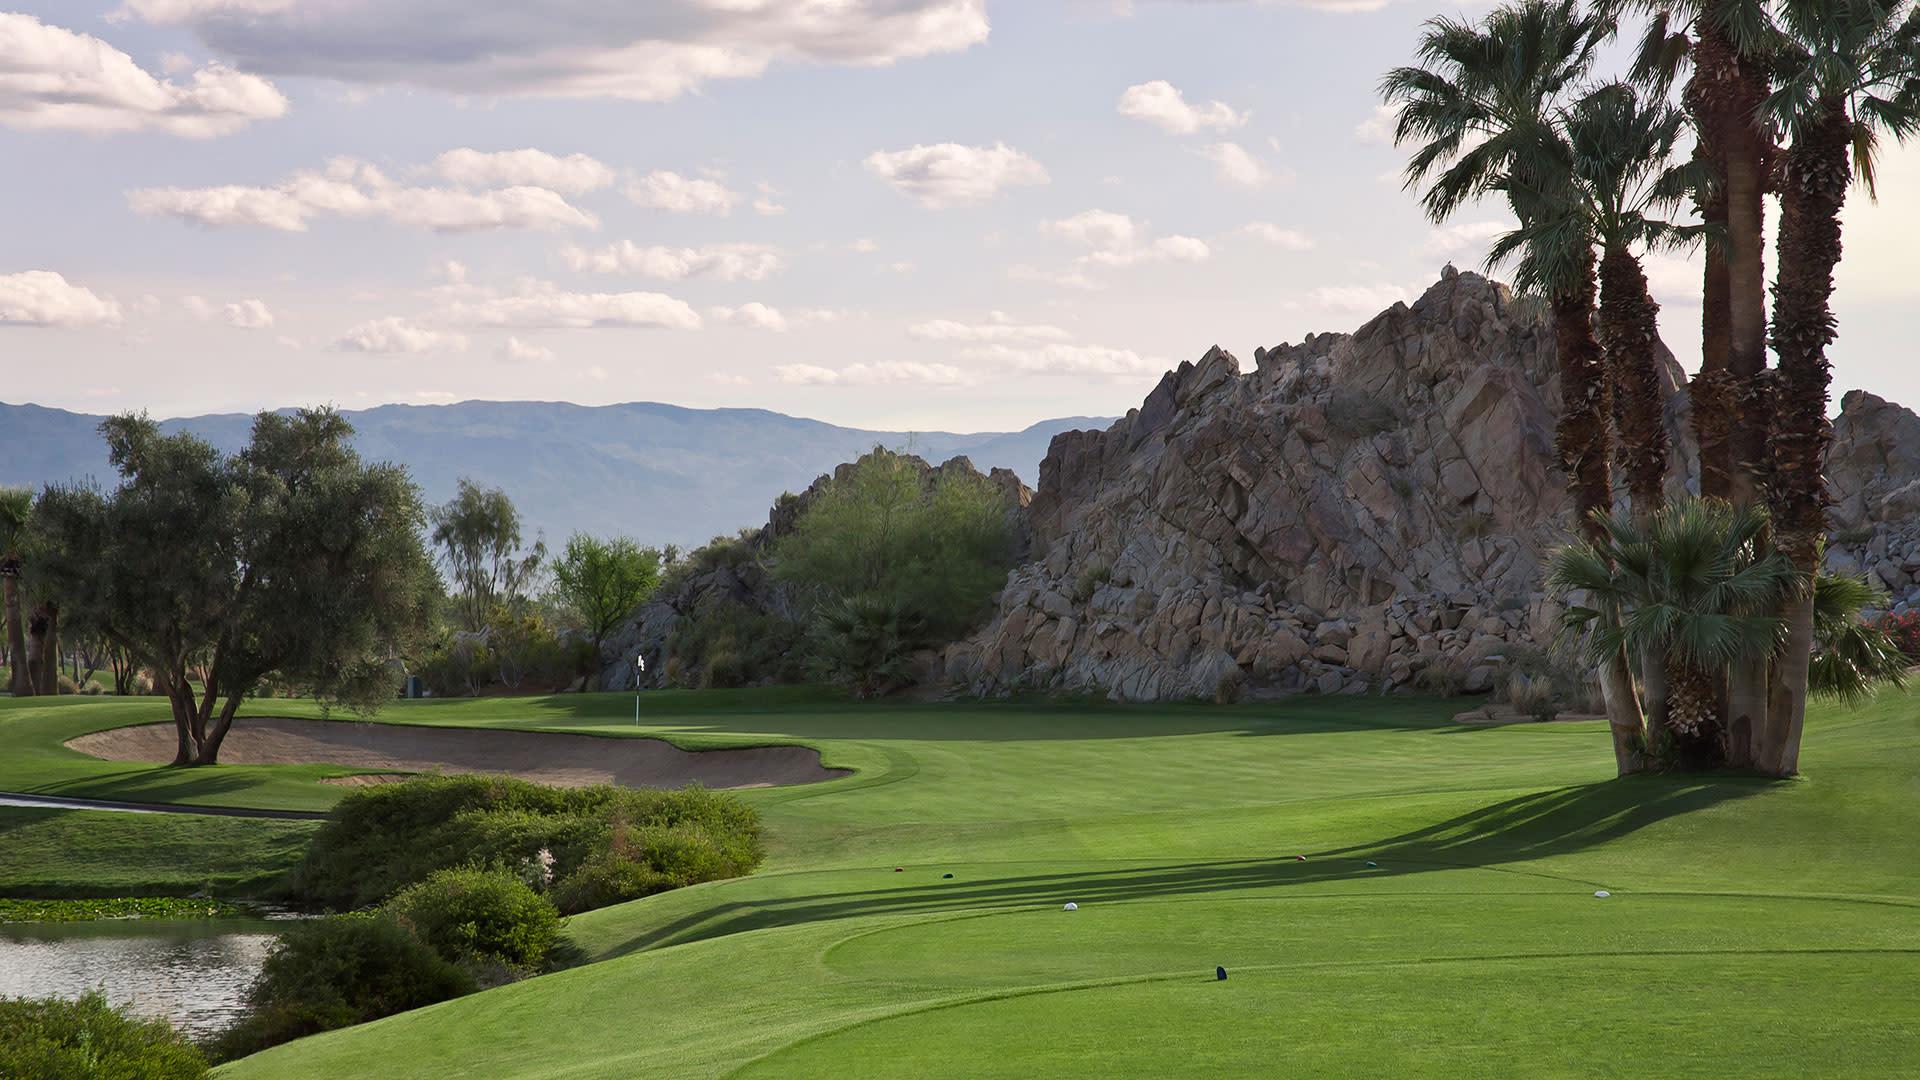 silverrock resort golf course